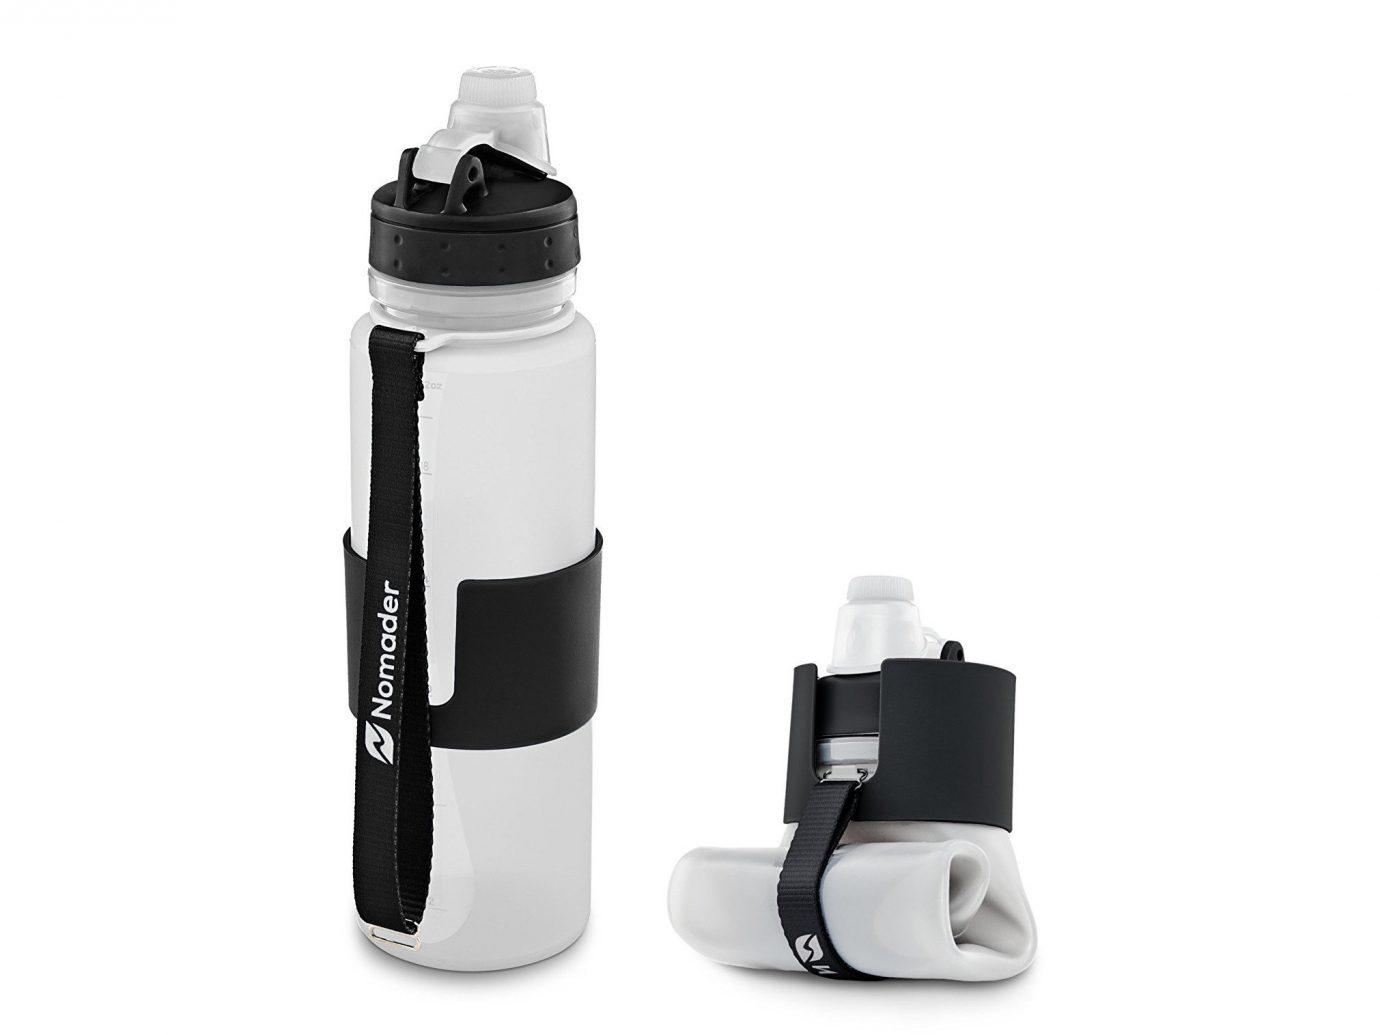 Packing Tips Travel Shop Travel Tips product water bottle bottle product design drinkware lighter different kitchen appliance